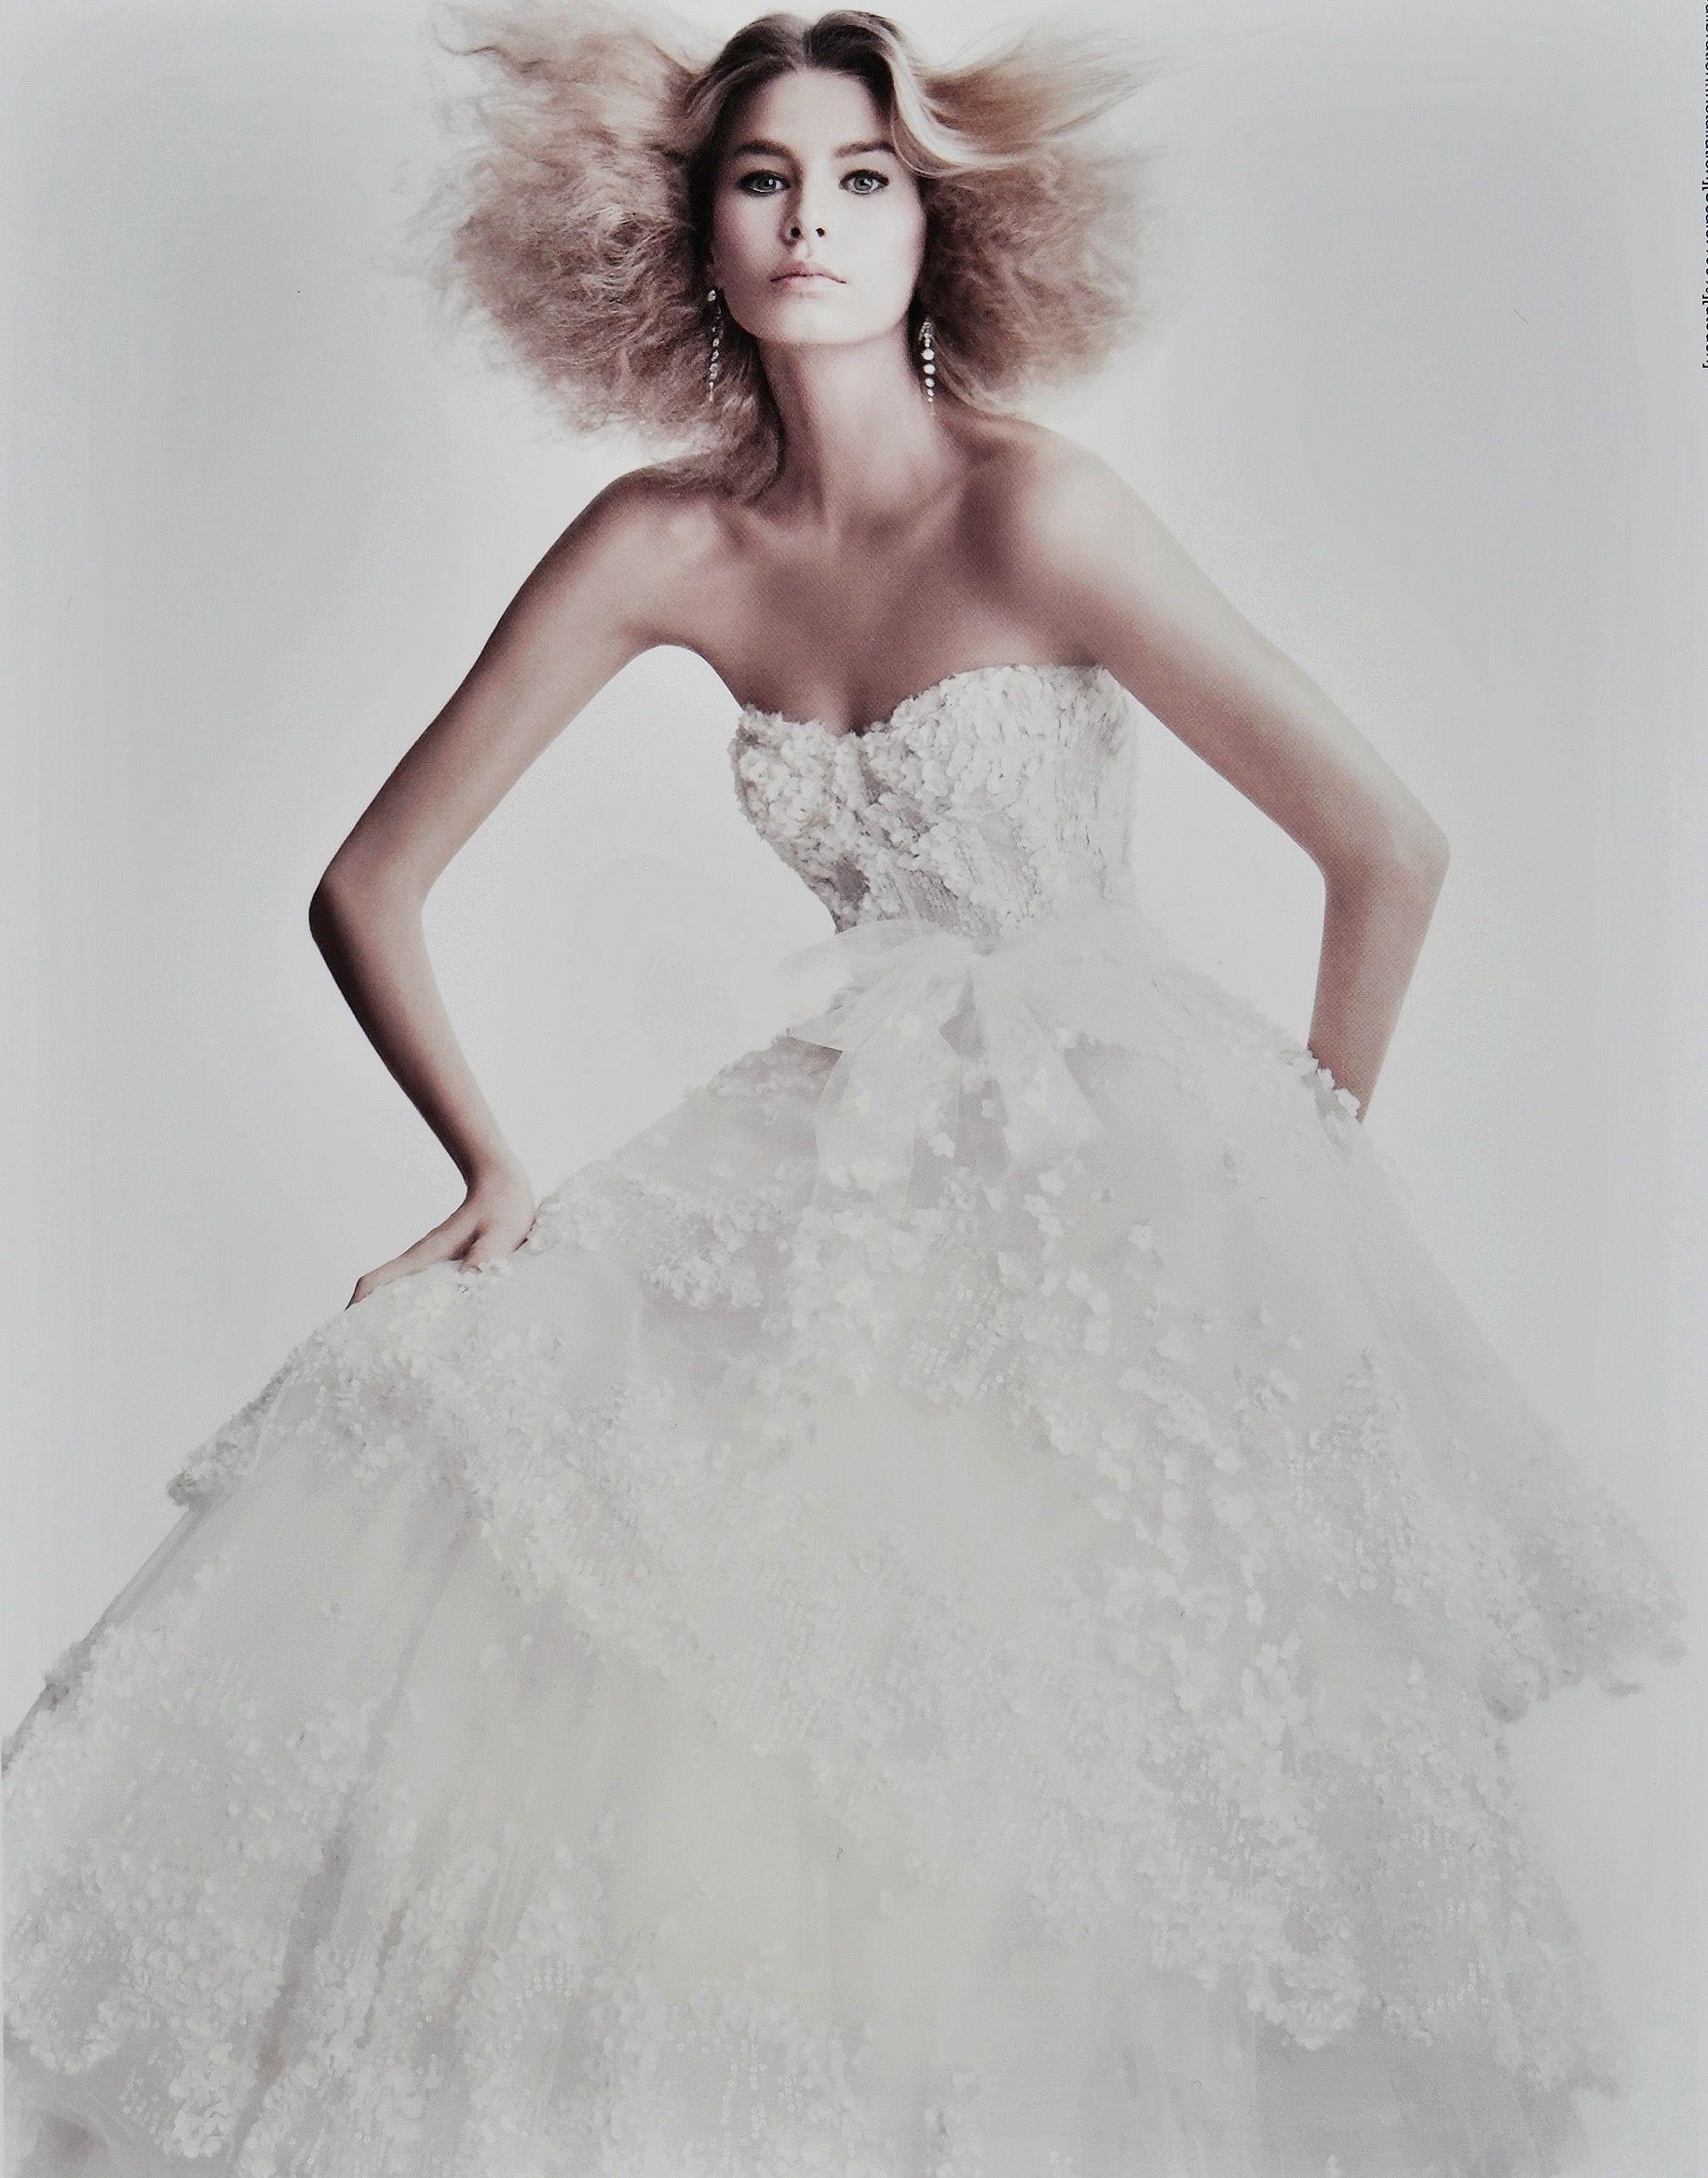 Monique Lhuillier Looks Back On 20 Years of Bridal Fashion   Monique ...